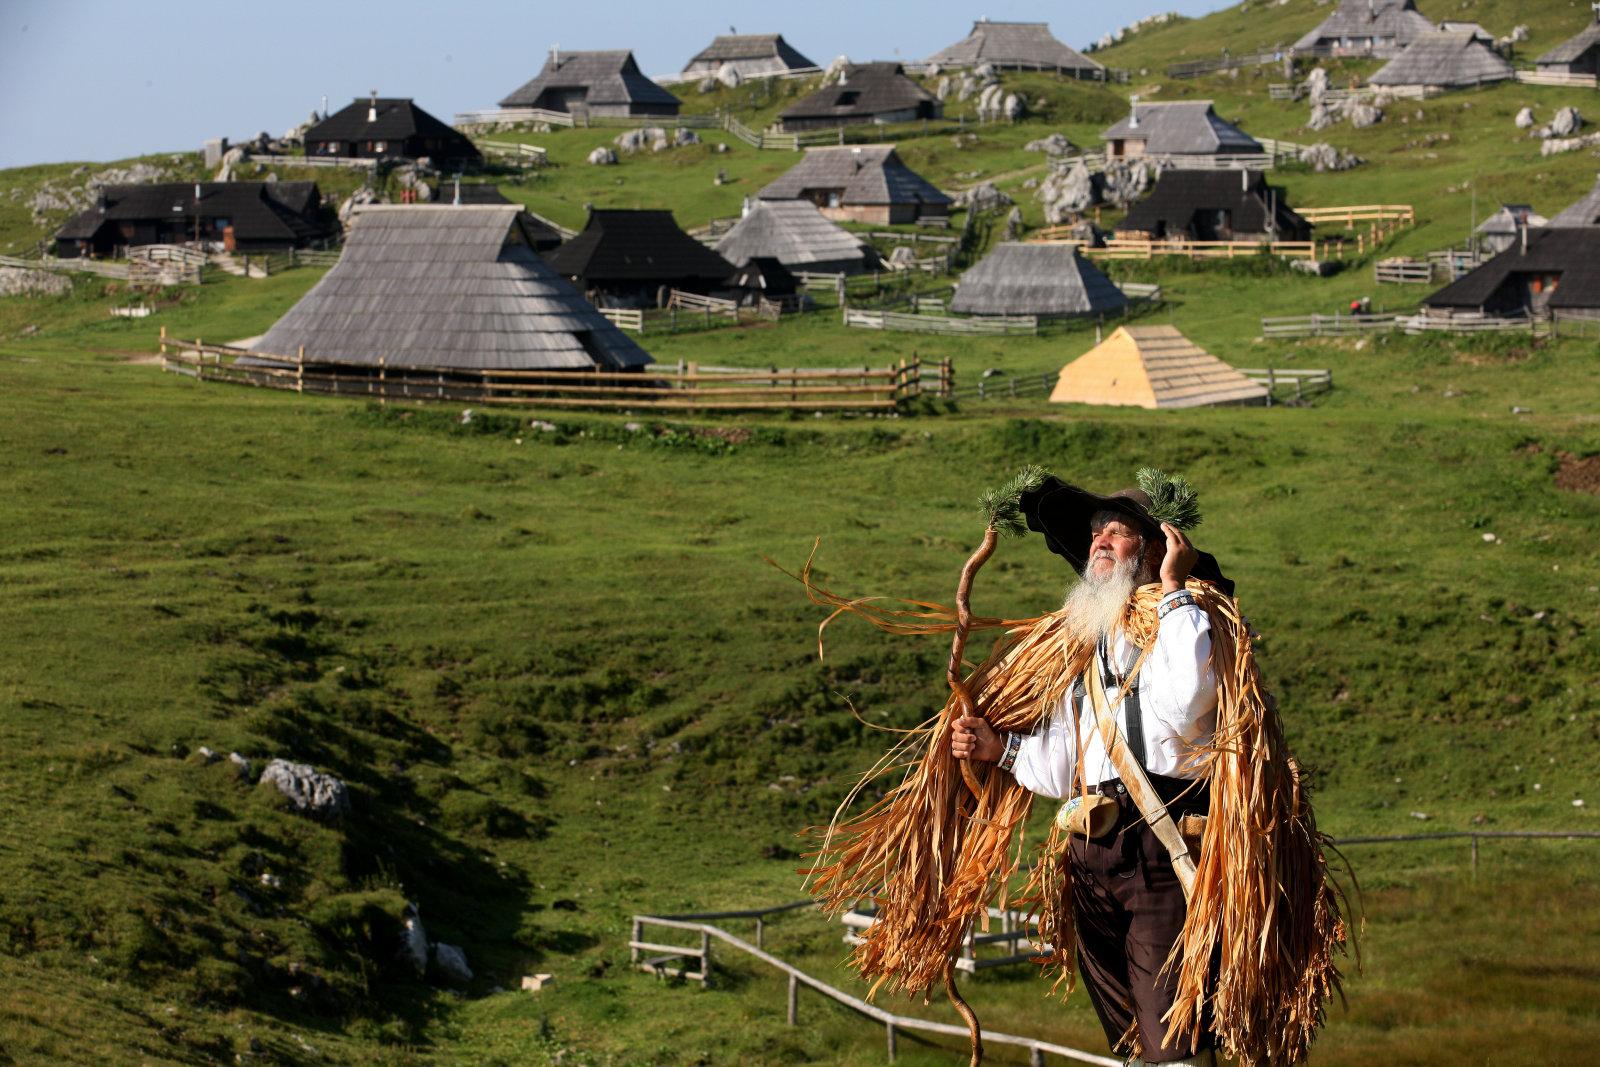 velika-planina-herders-huts